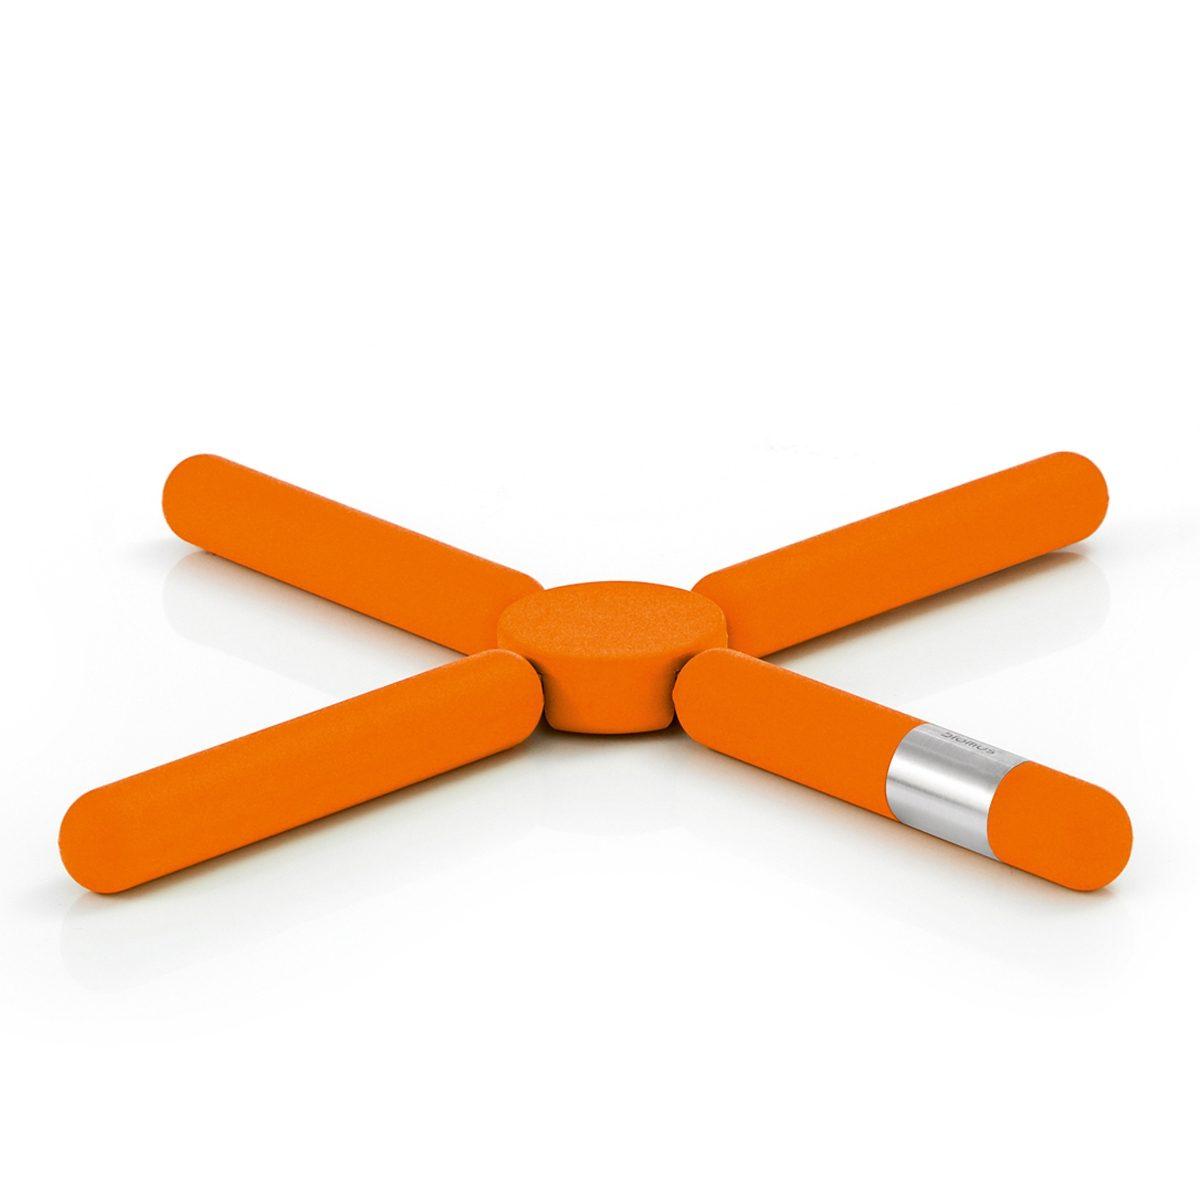 BLOMUS Blomus KNIK Untersetzer orange